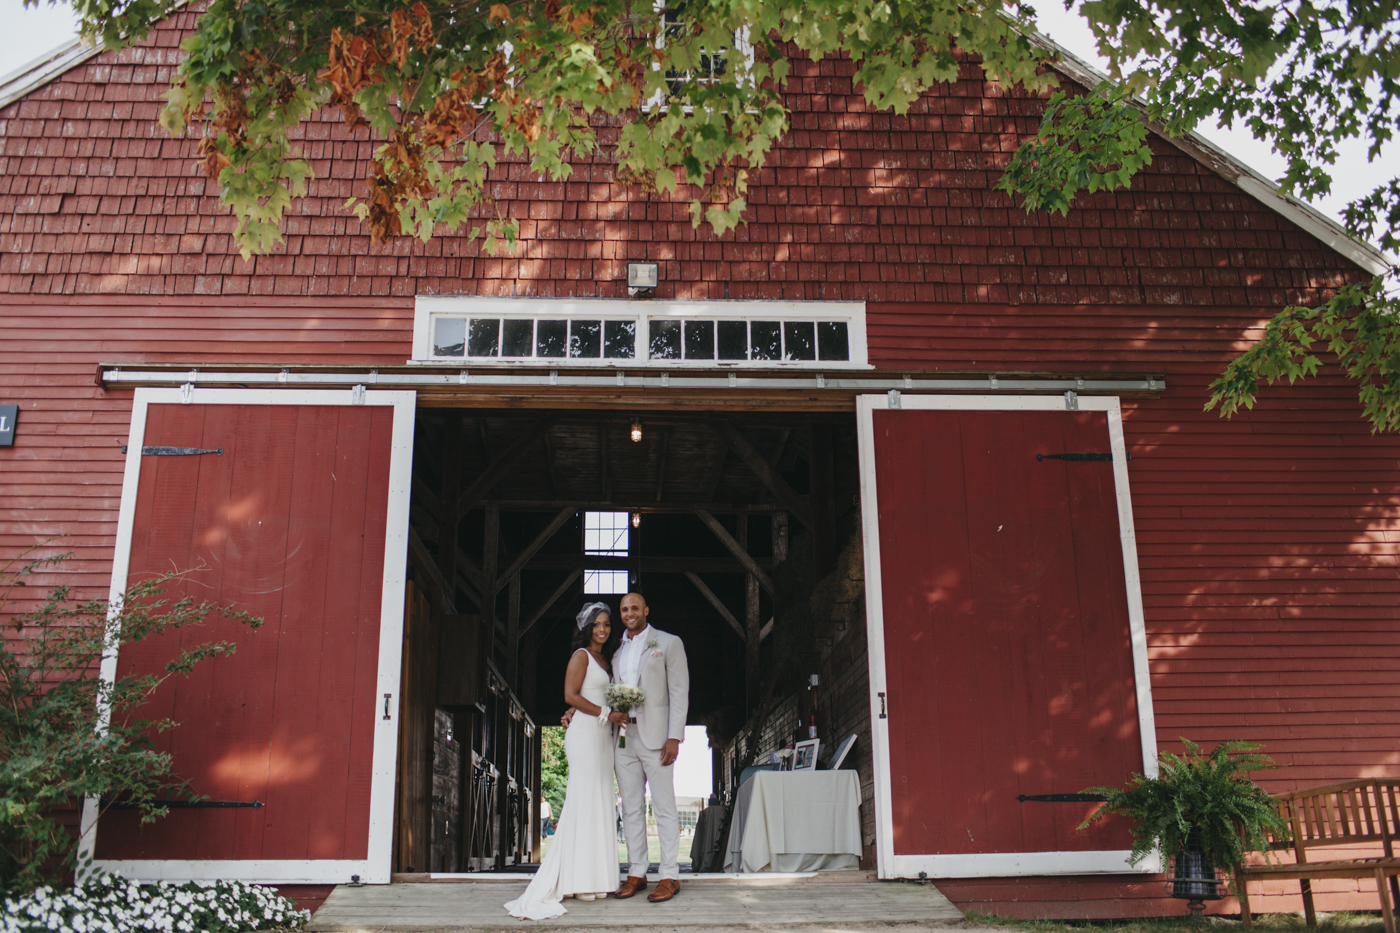 Toni_Earl_Rest_and_Be_Thankful_farm_wedding_maine_015.jpg